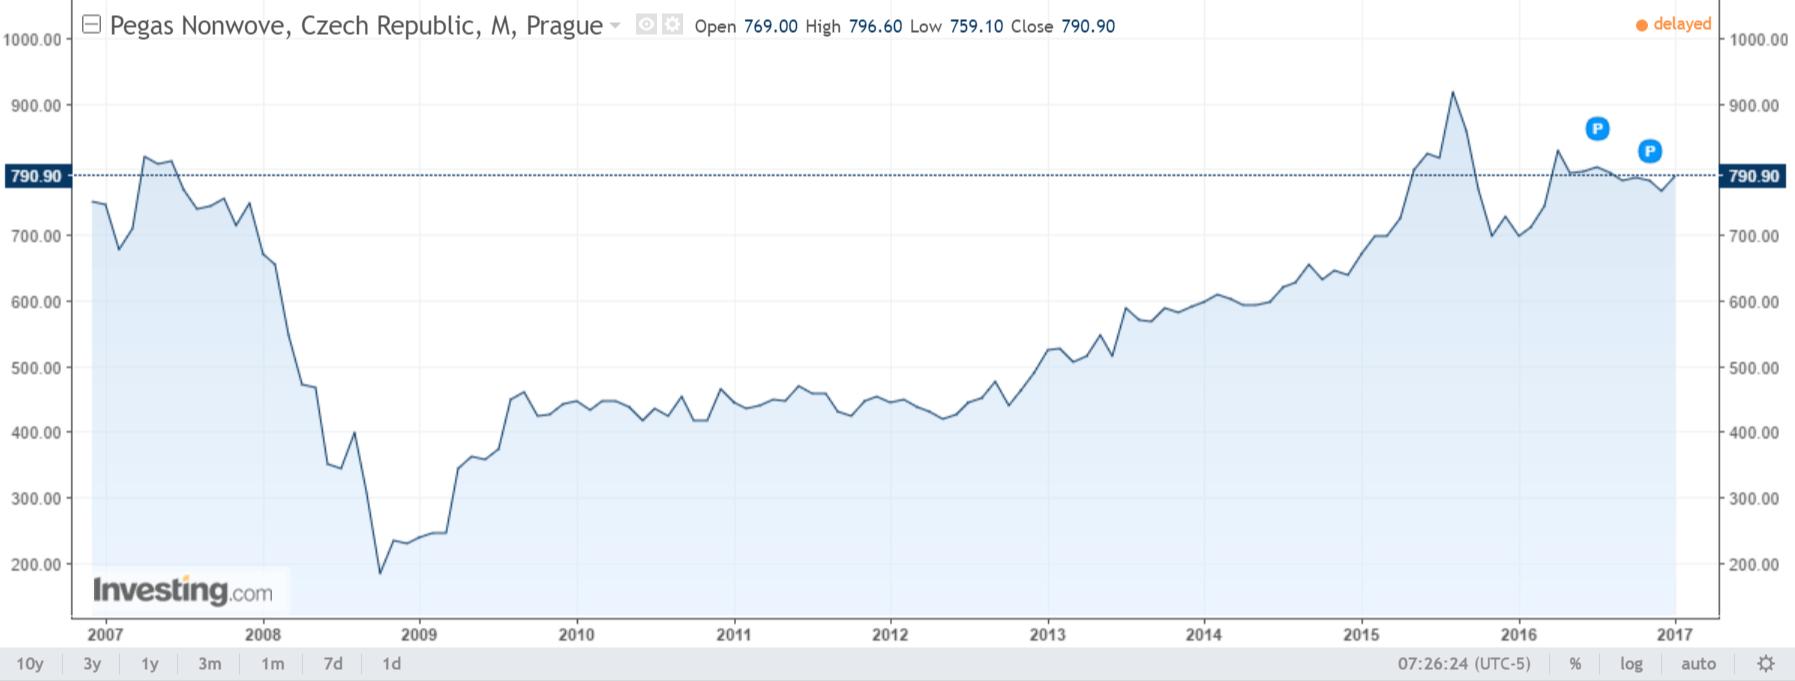 Pegas Nonwove Chart PGSN - Investing.com